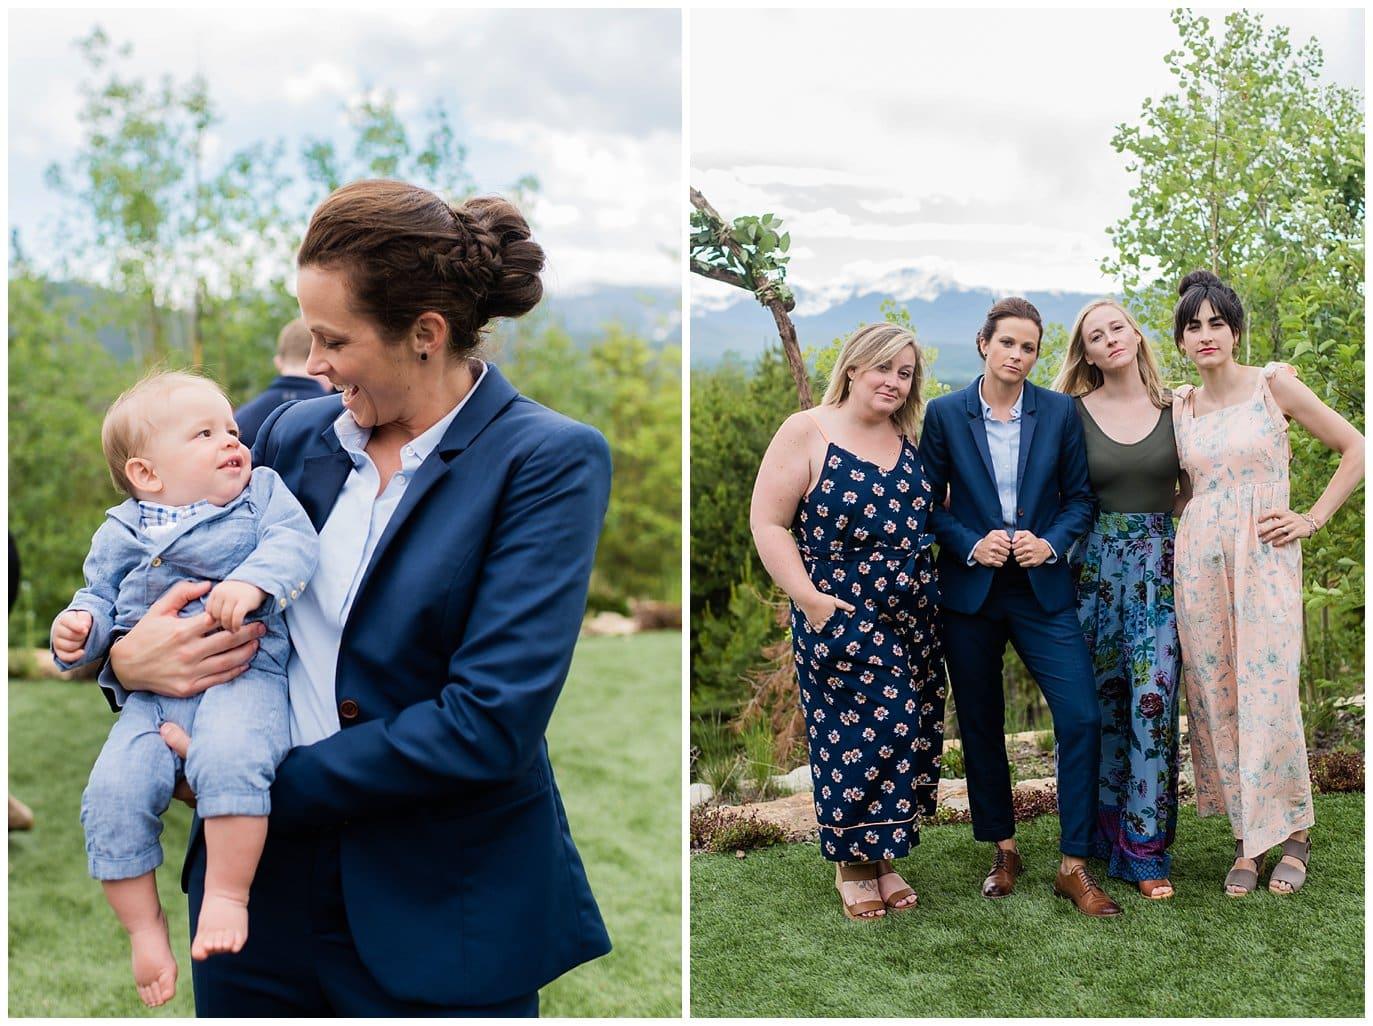 friend groups at Colorado wedding photo